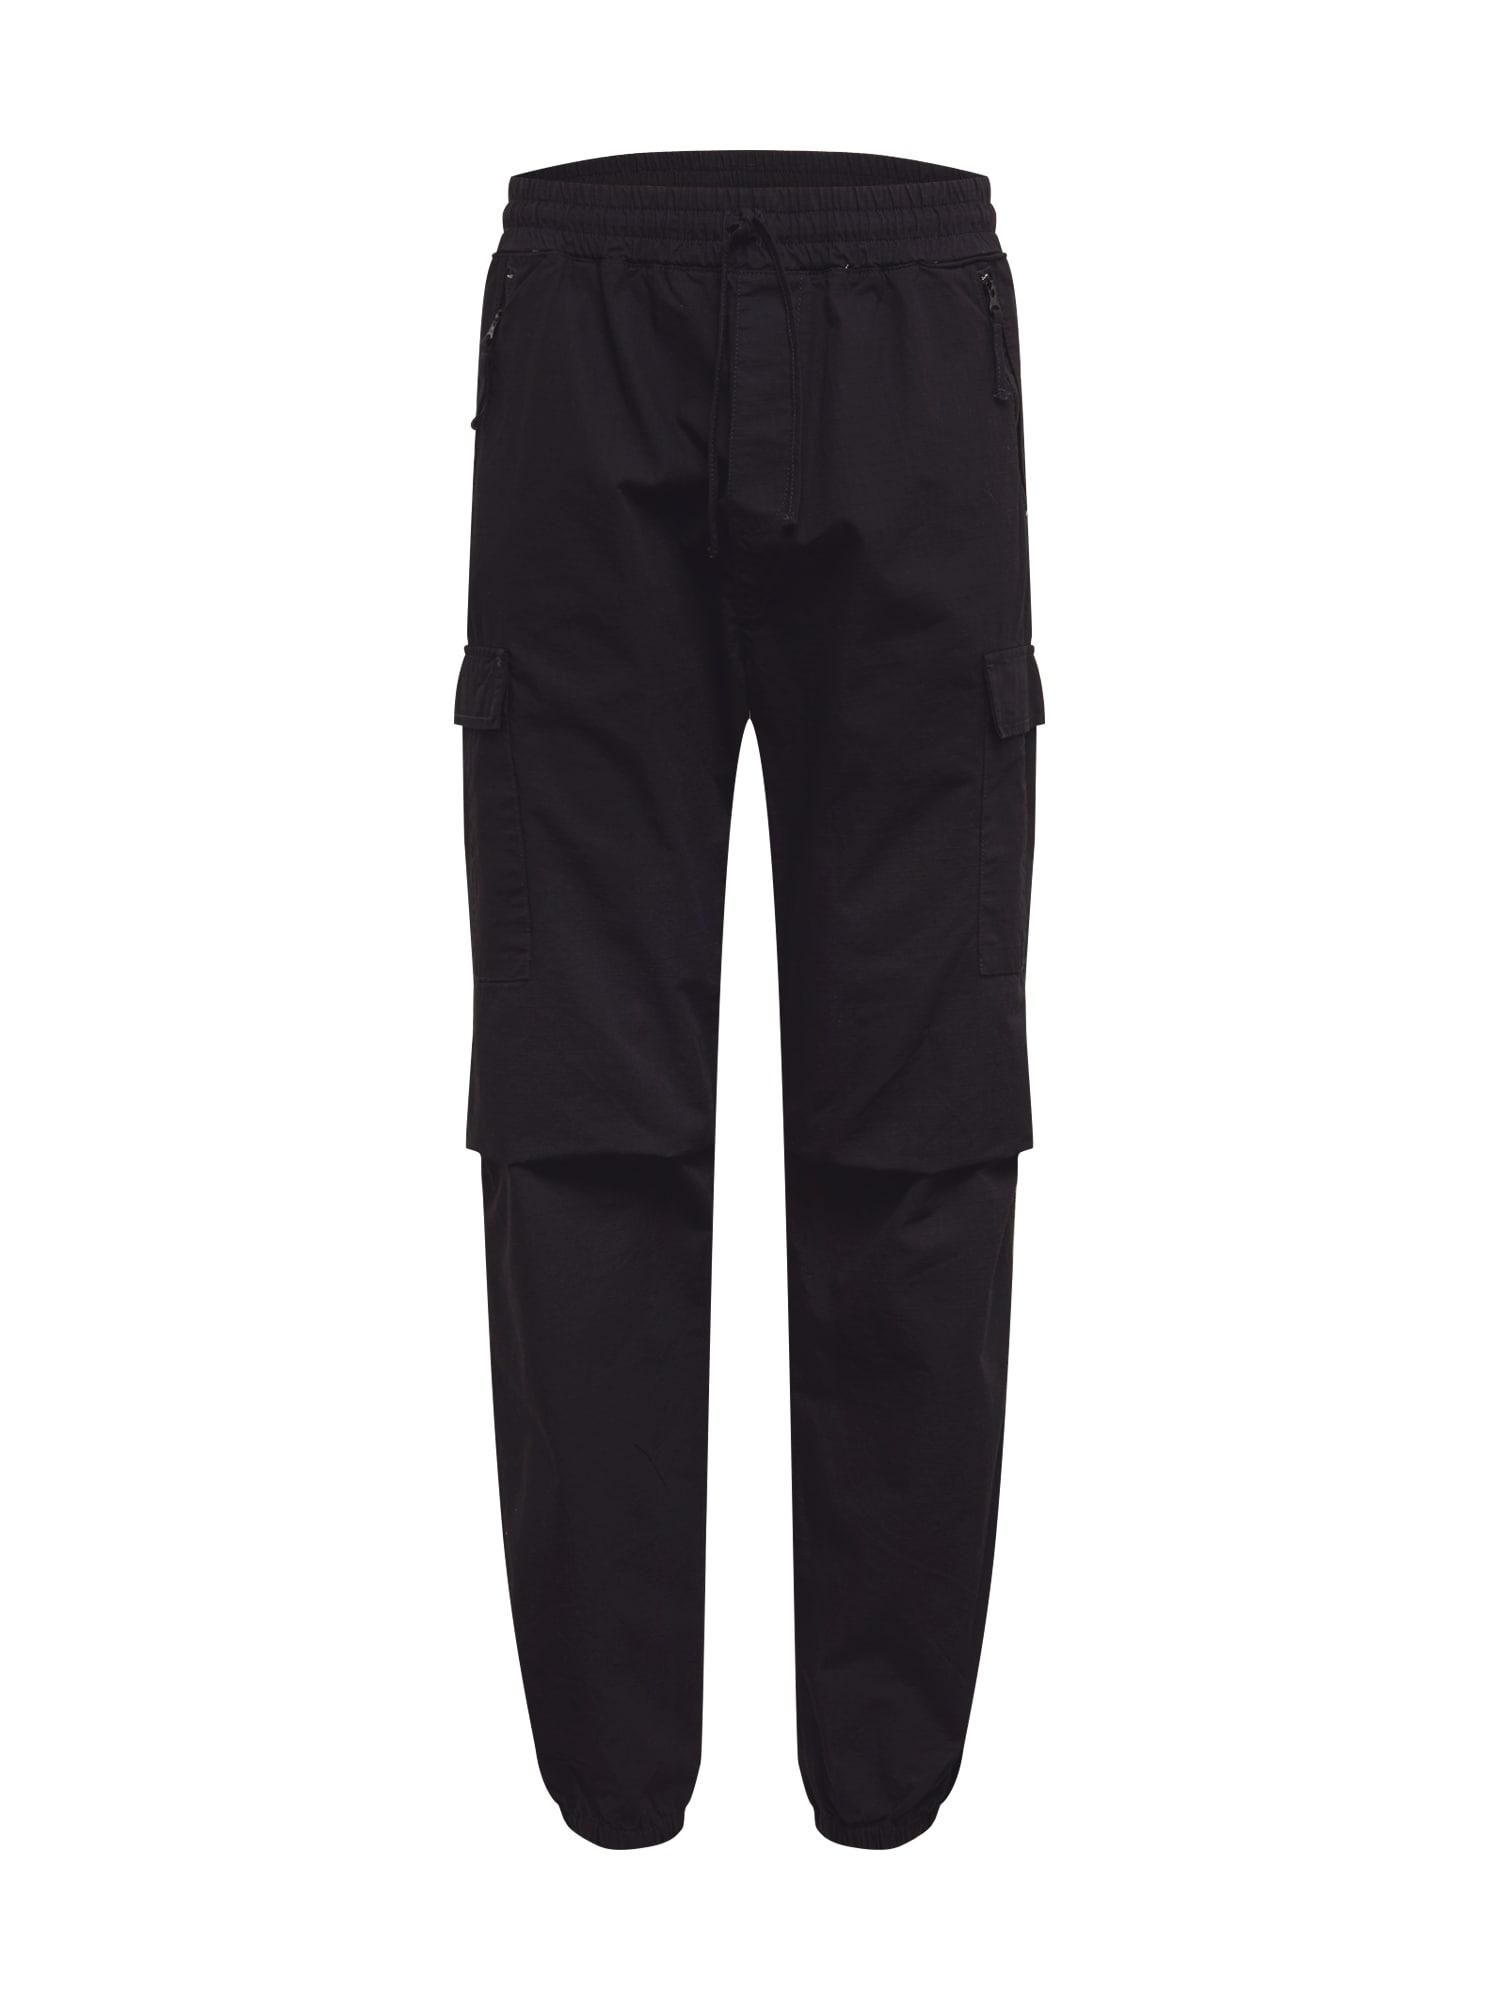 Carhartt WIP Kelnės juoda